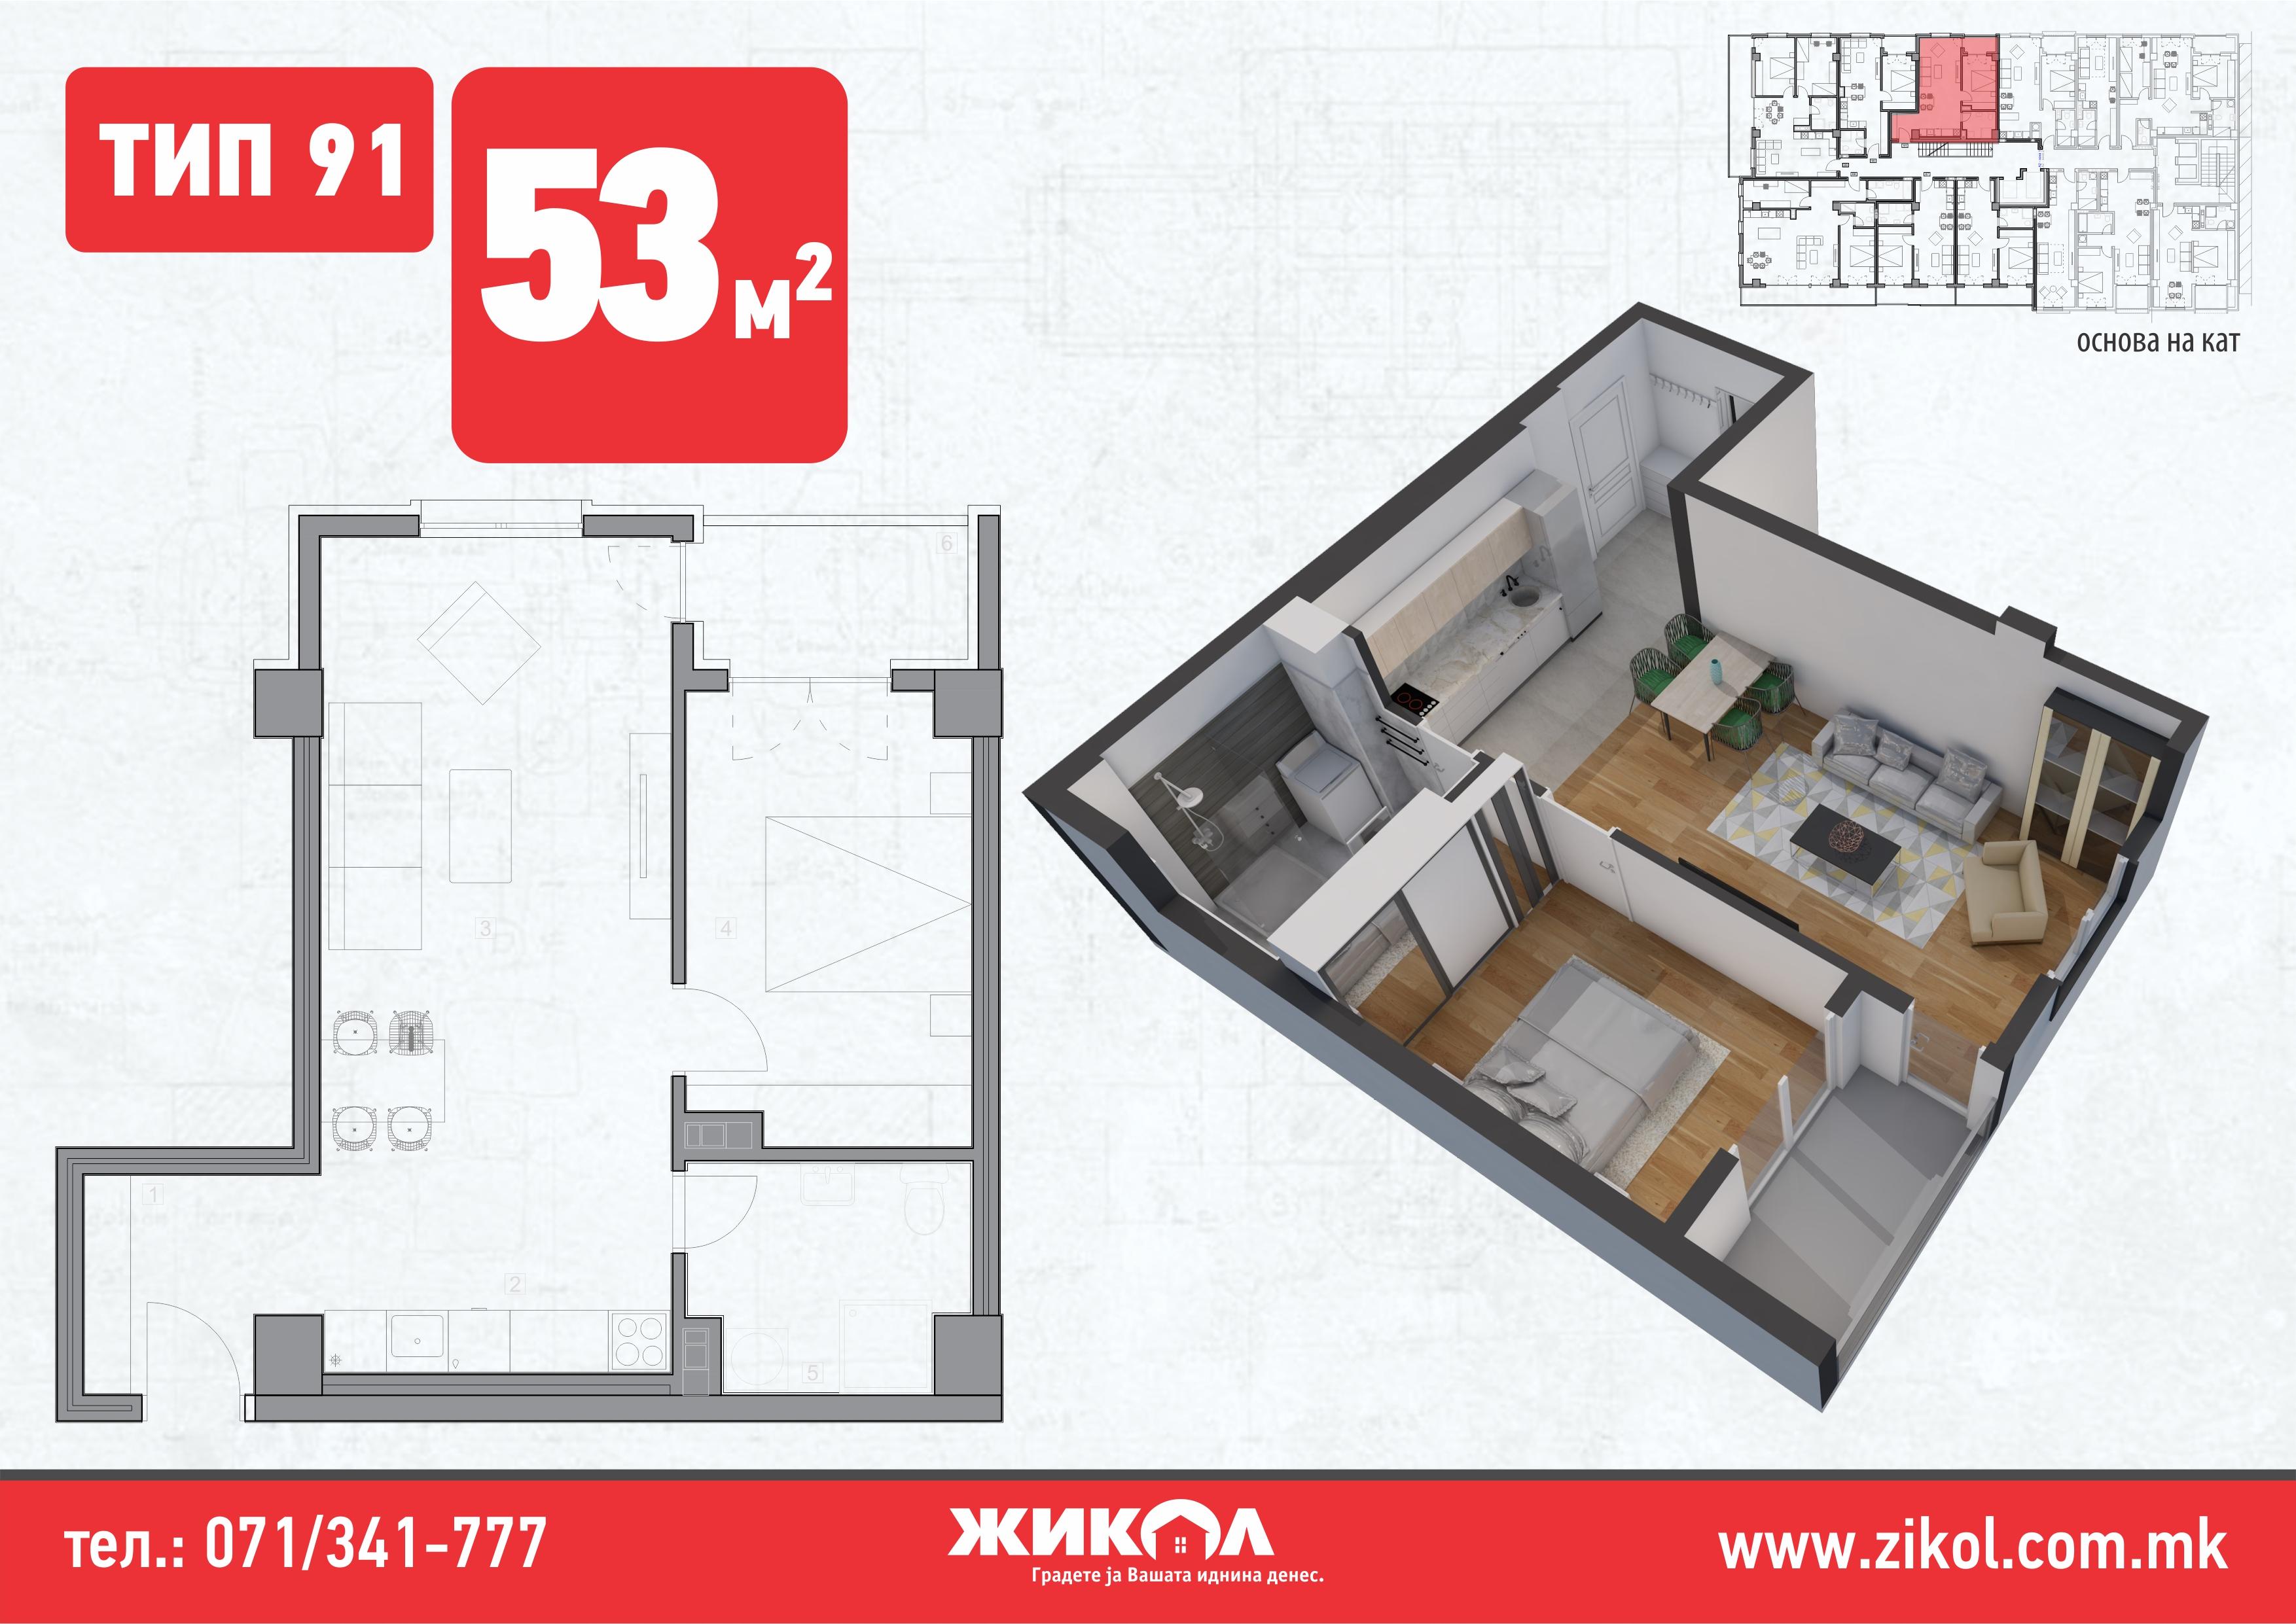 Зграда 55, кат 9, стан 91